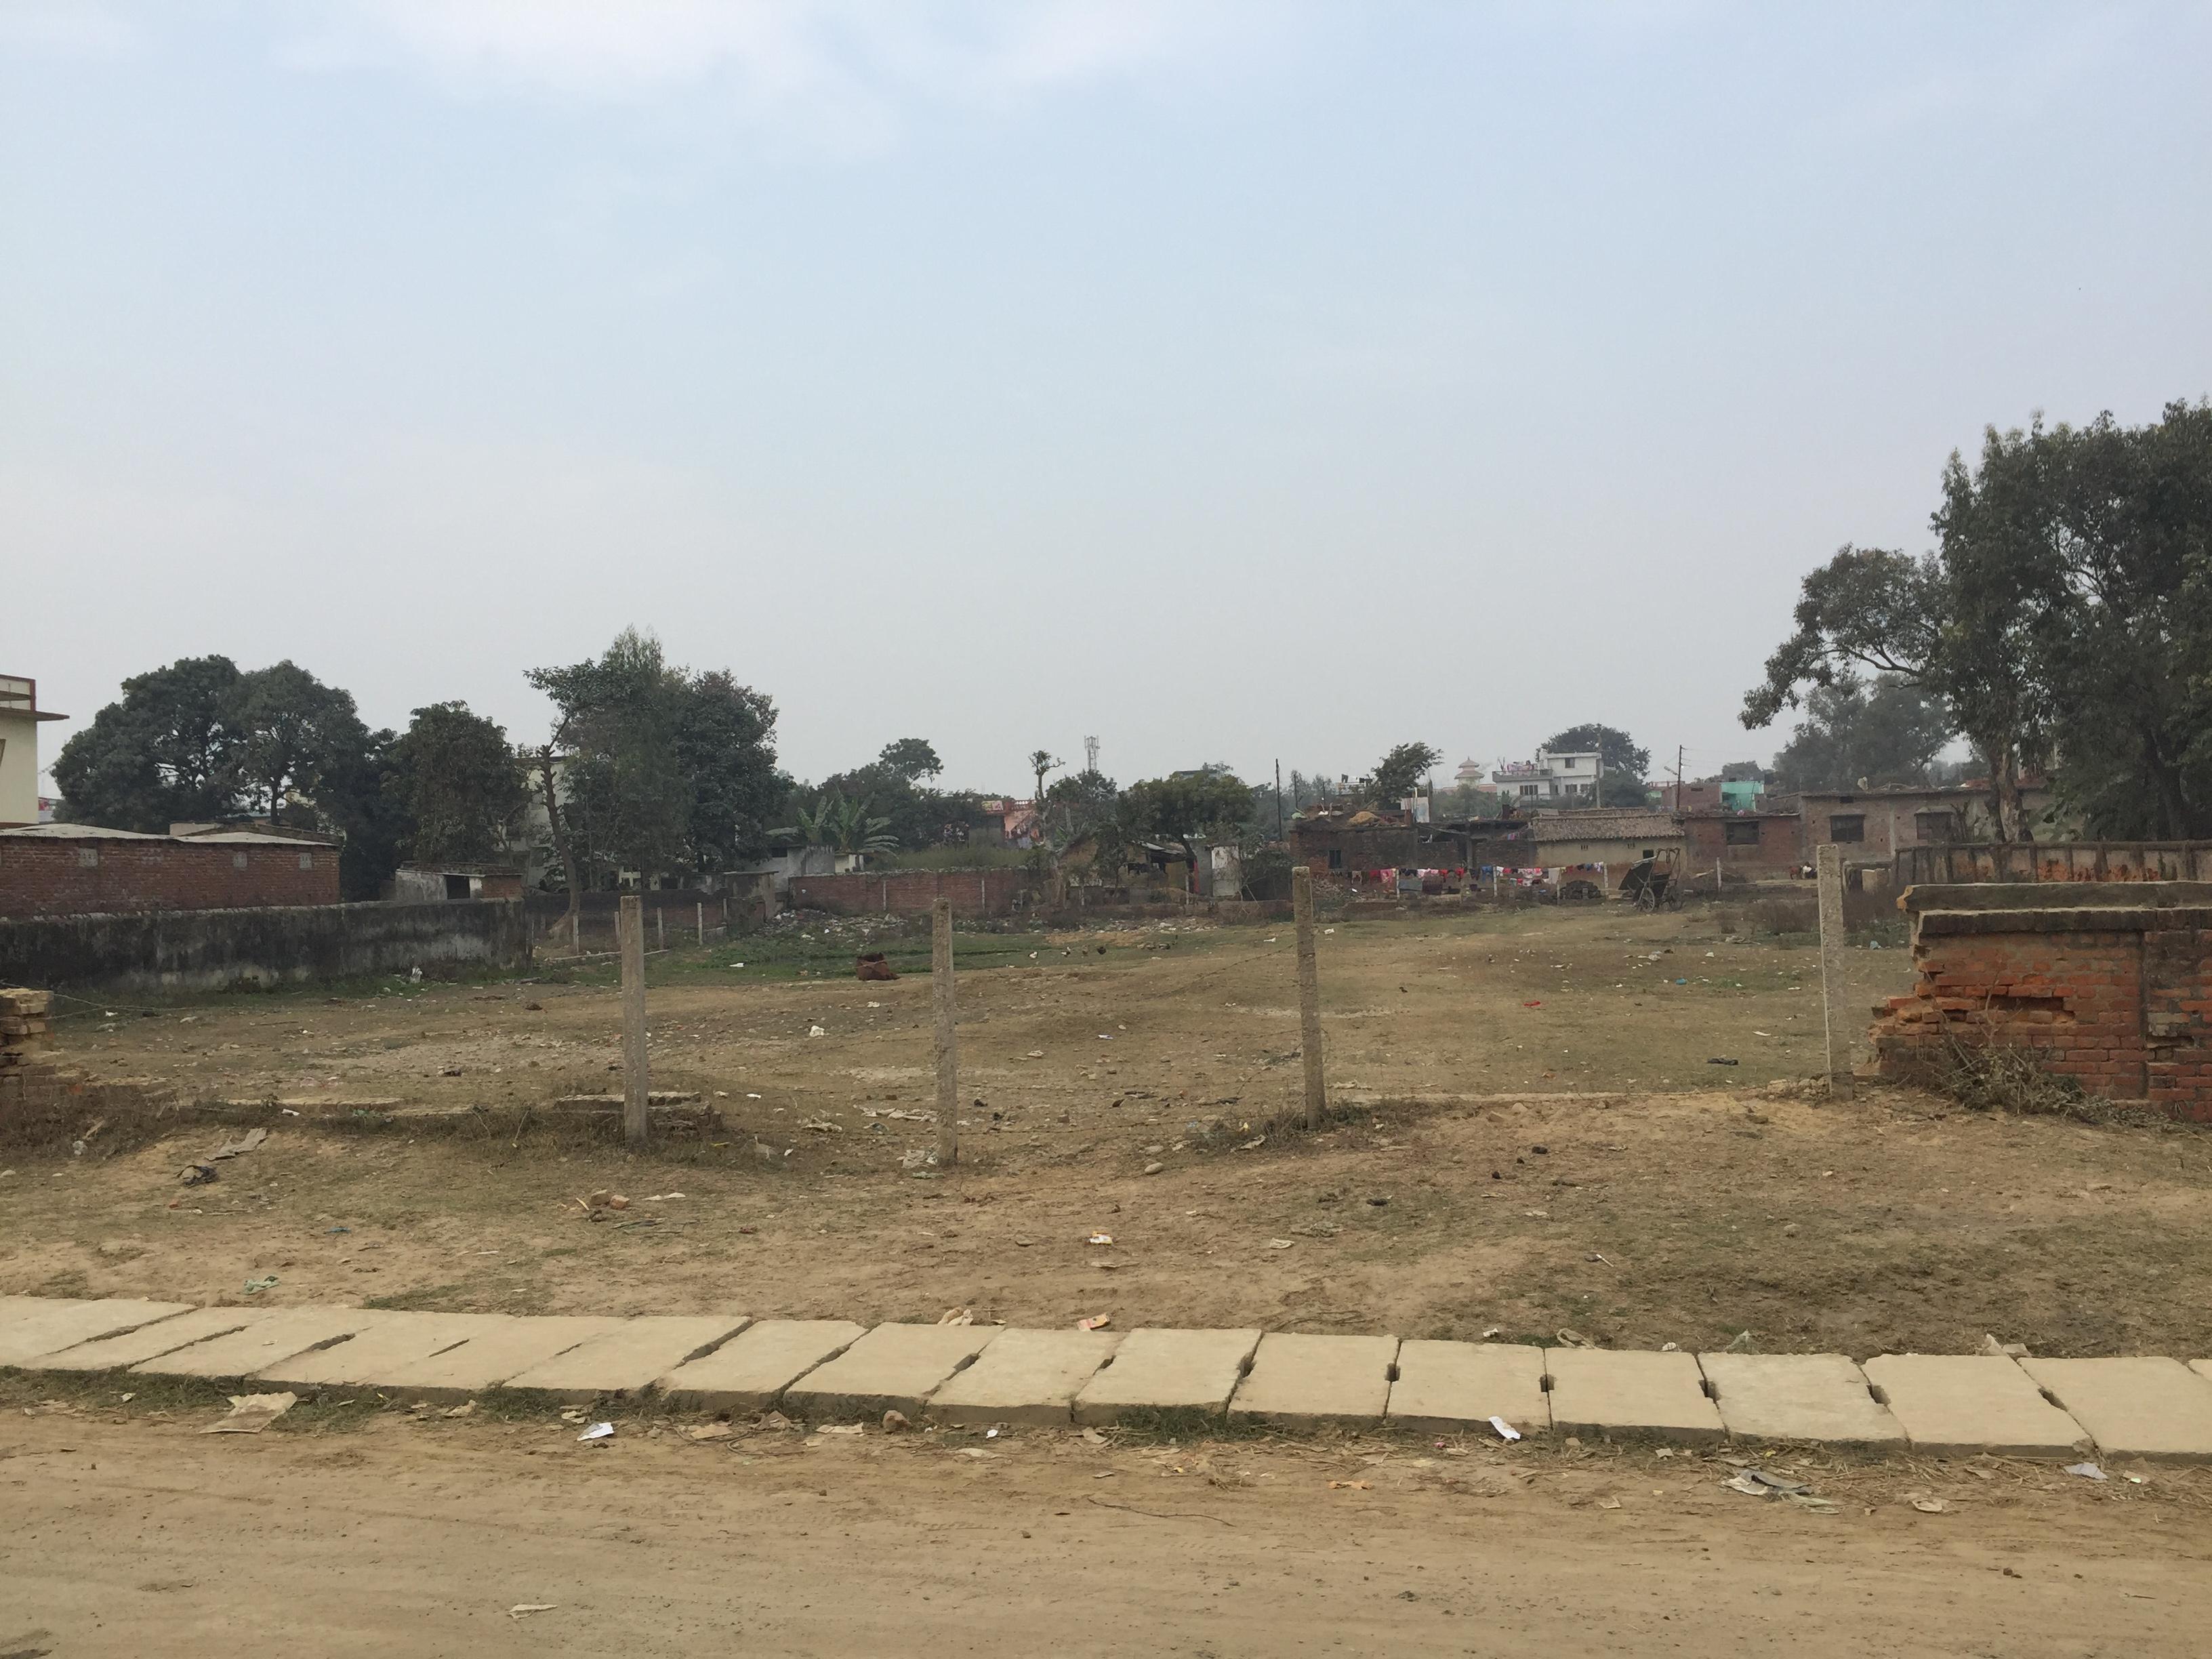 Large Plot available for sale in Banke Gaon, Nepalgunj – Banke – IMG_1974